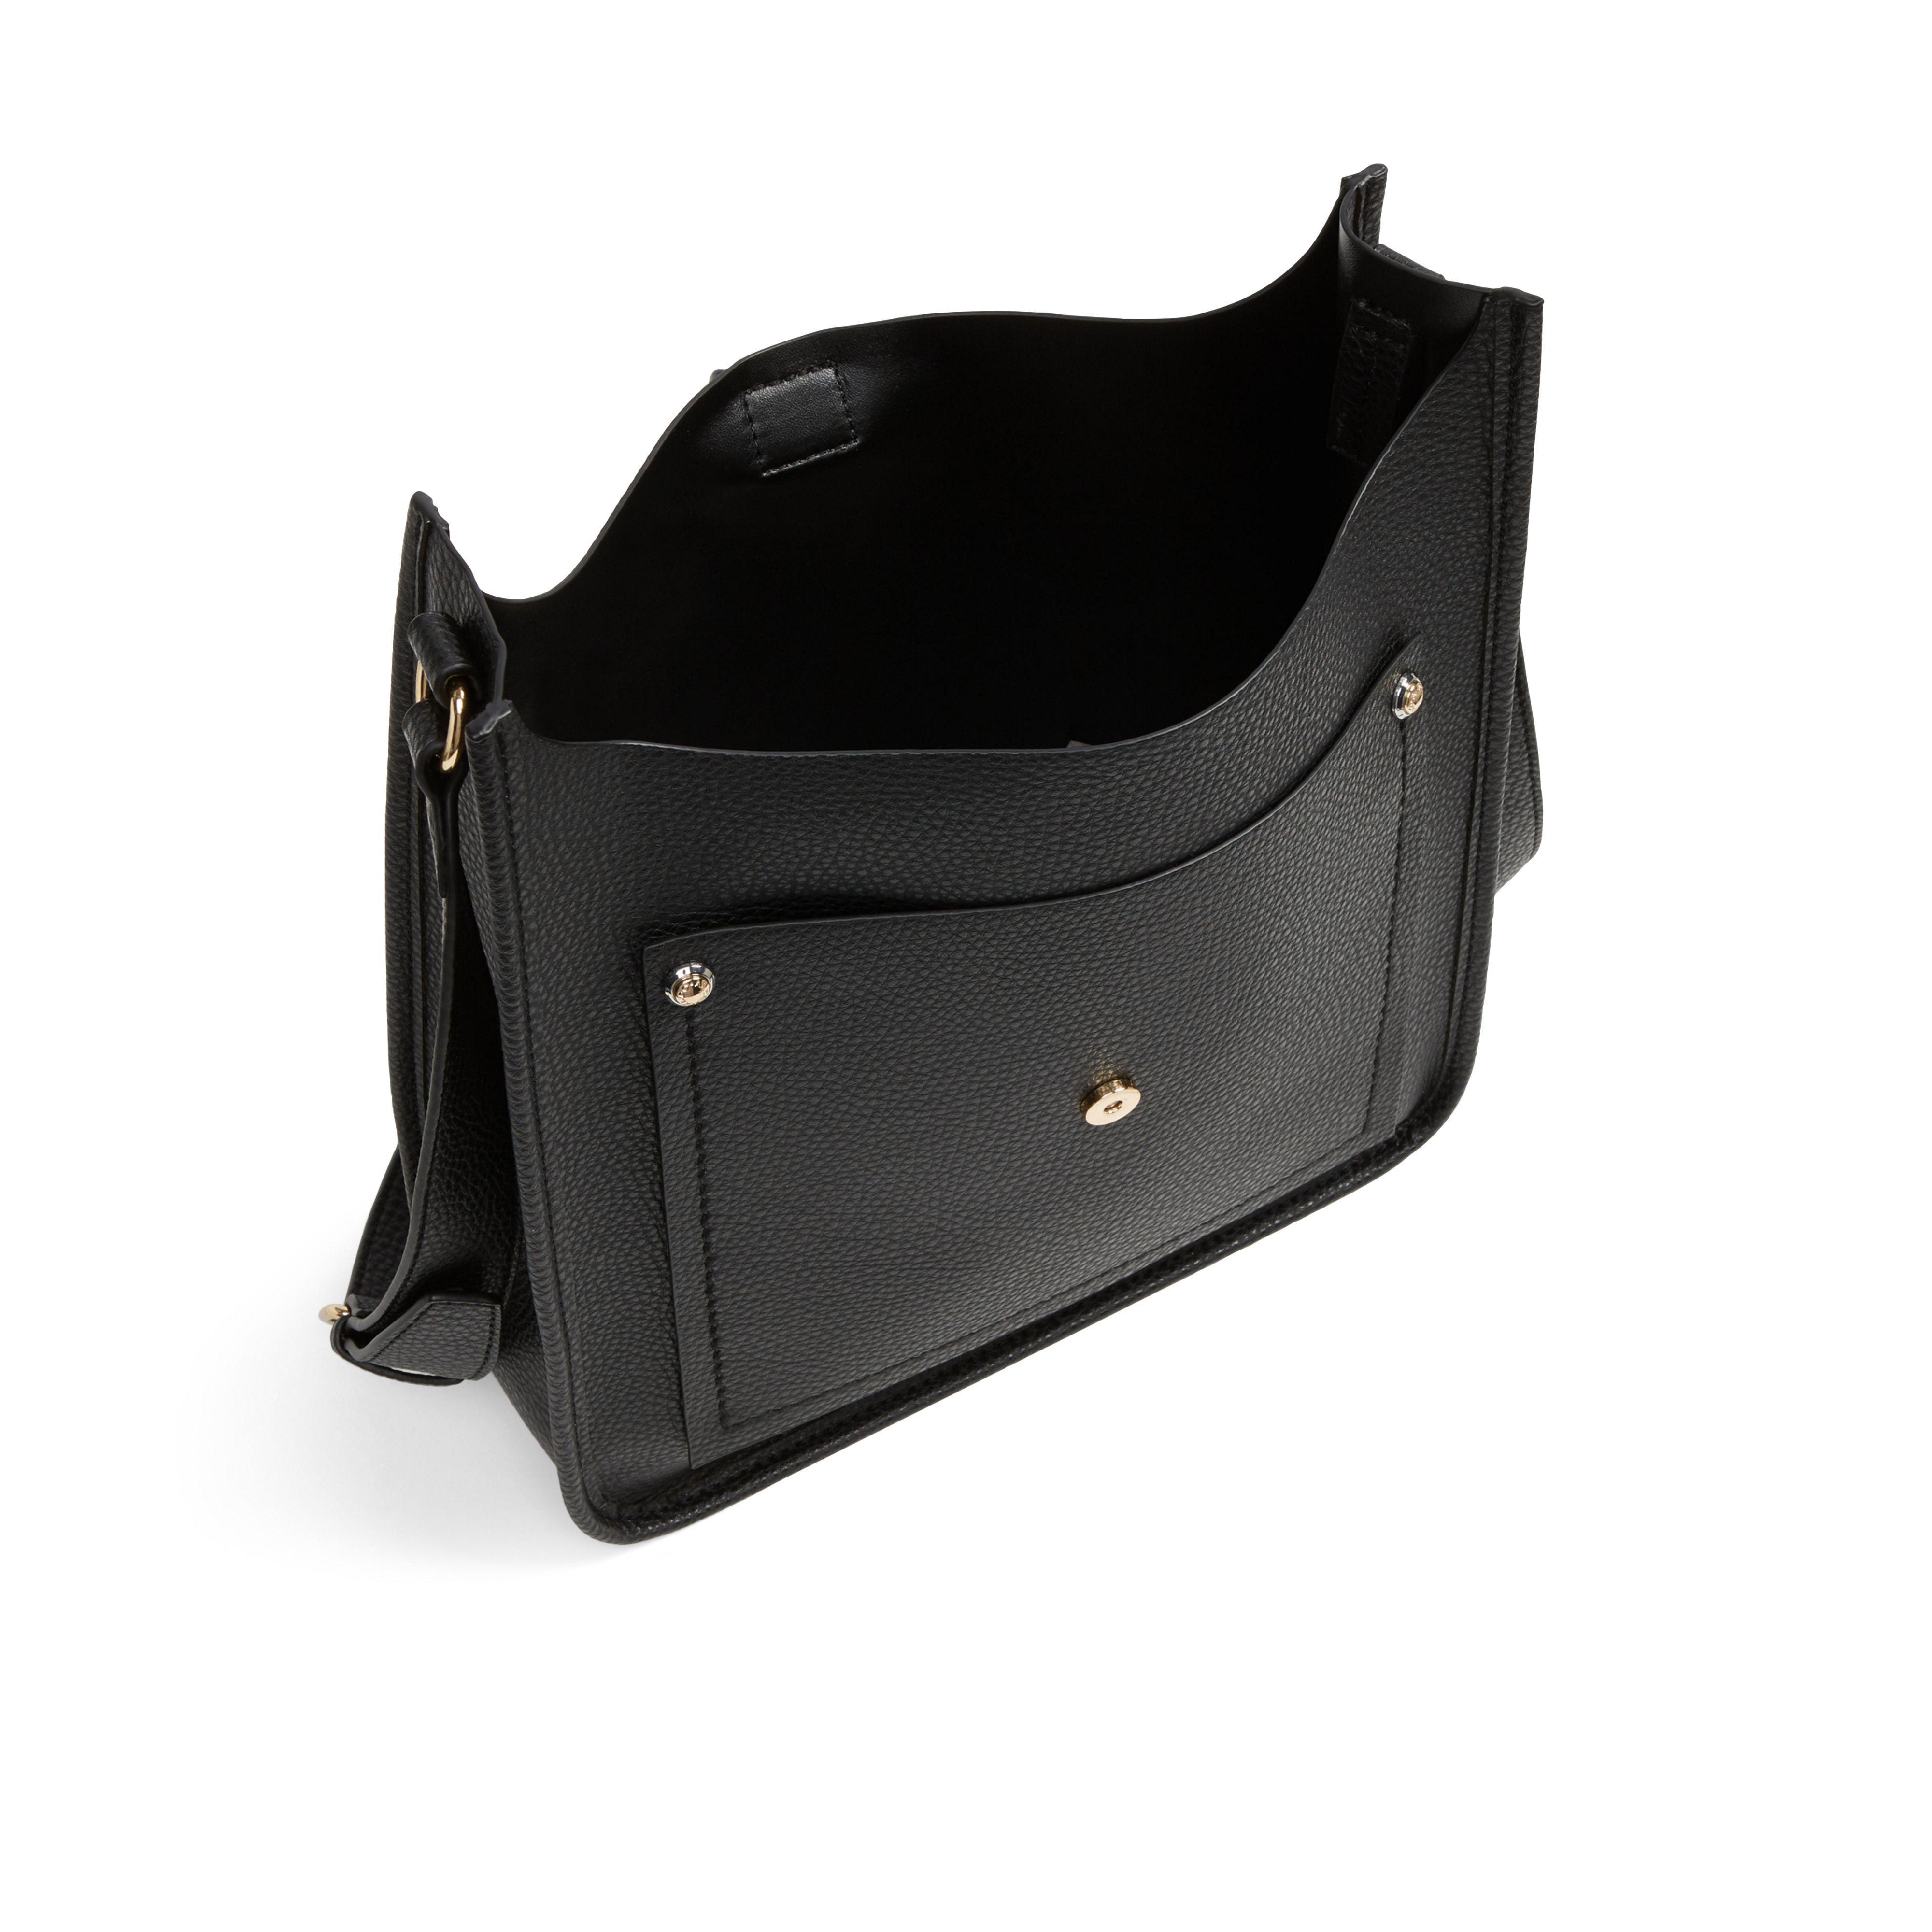 ALDO Synthetic Aciri Cross Body Bag in Black